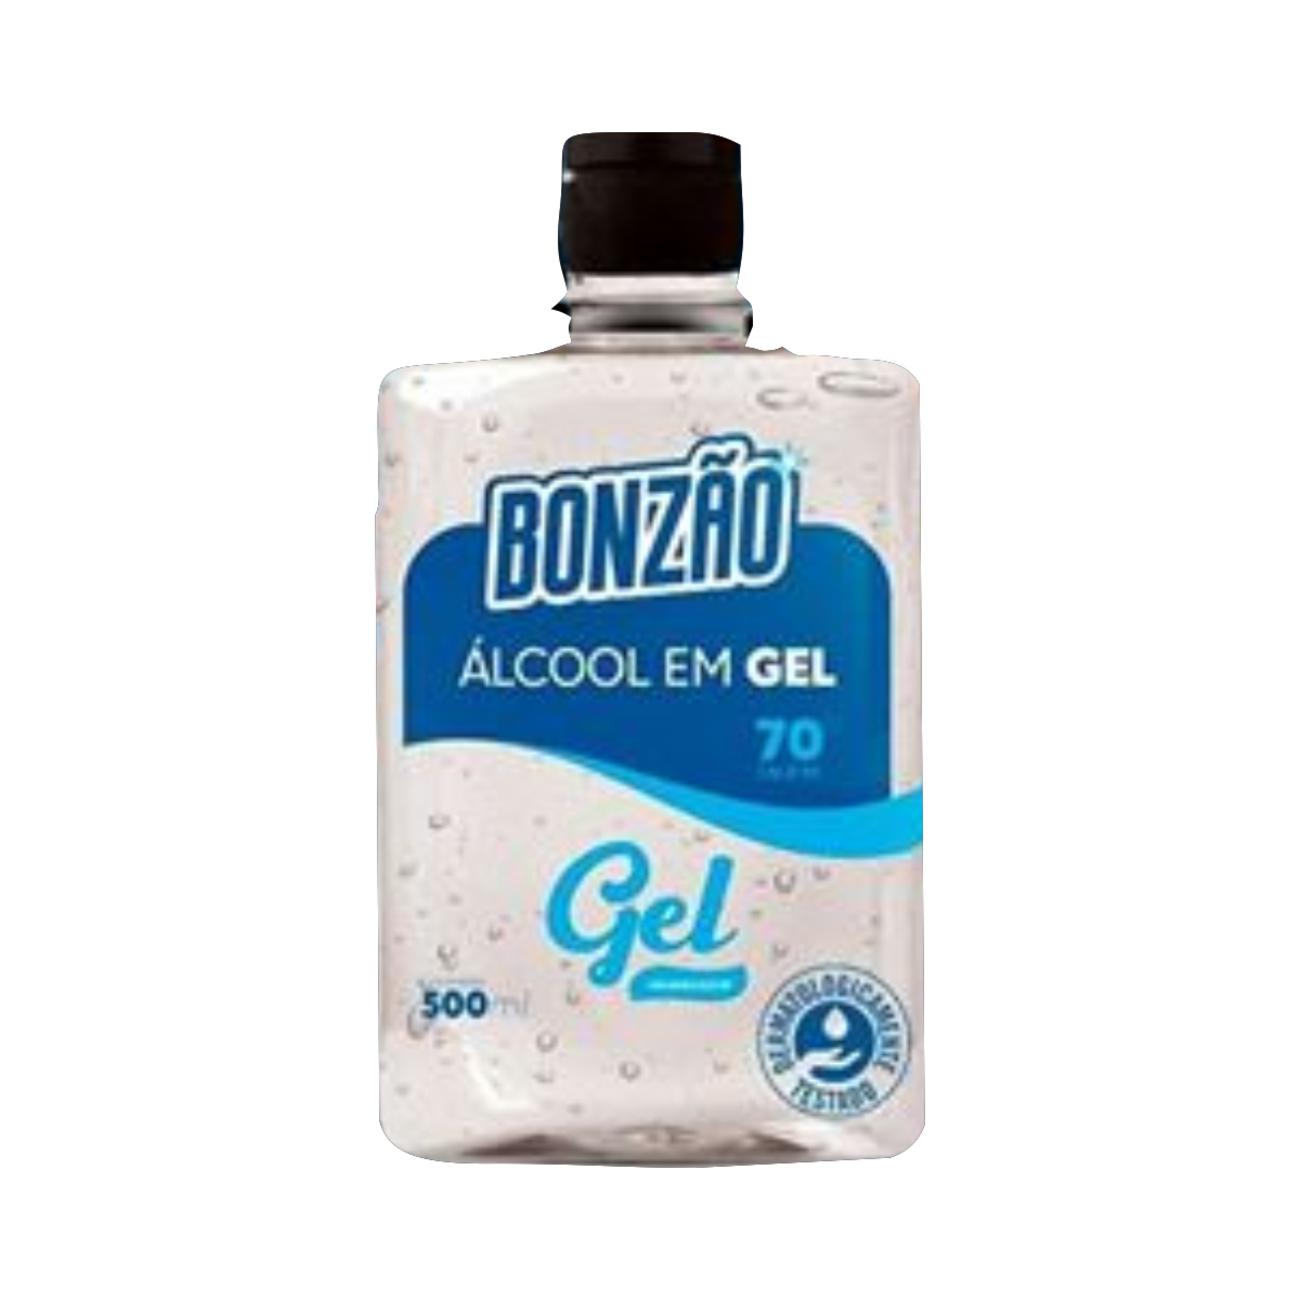 Alcool em Gel Bonzao Para Maos 70° 500Ml